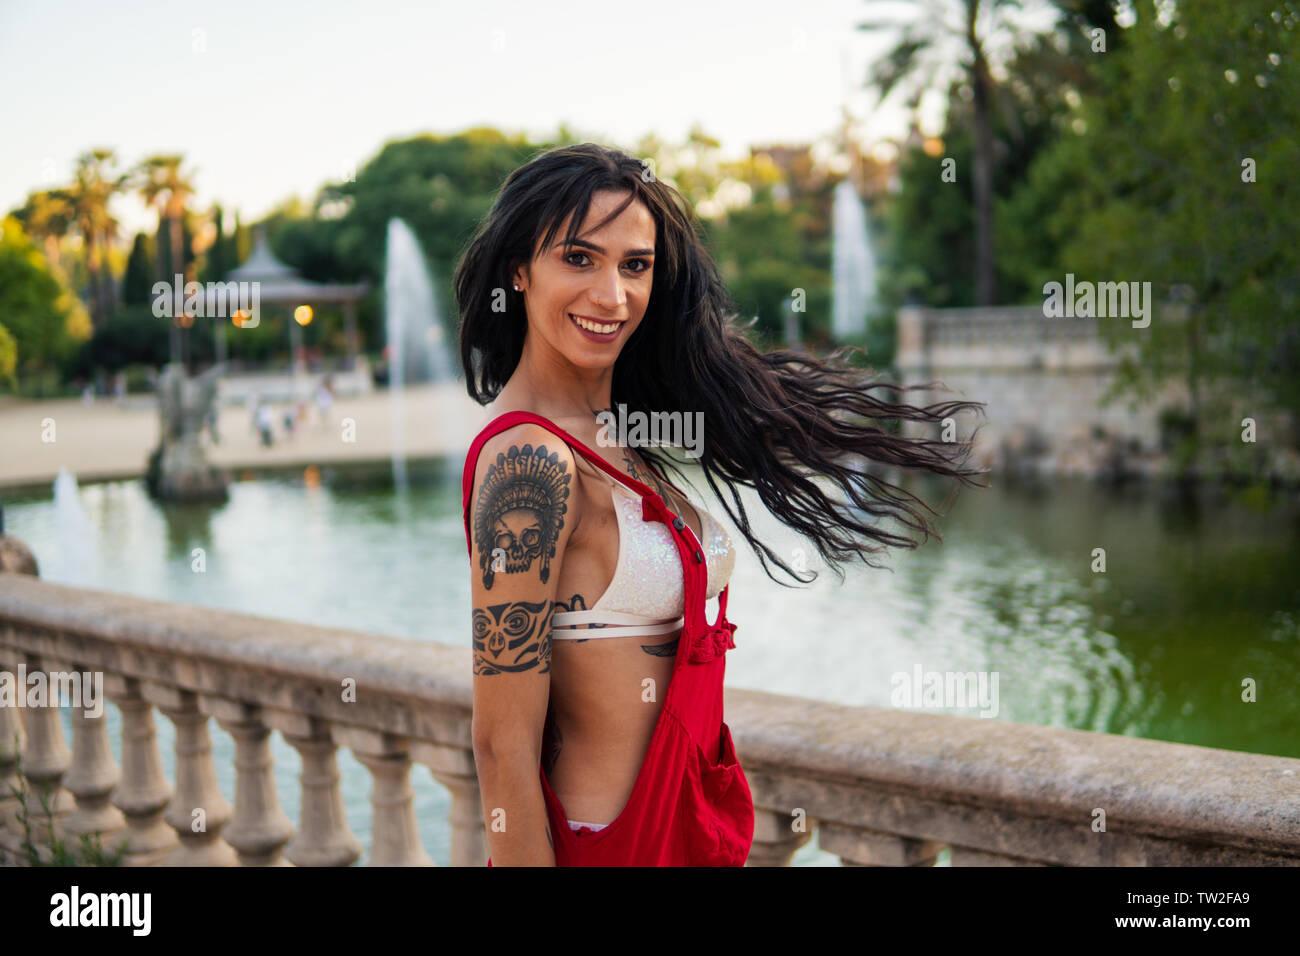 Ladyboy tattooed transgender model is dancing in the green park Stock Photo